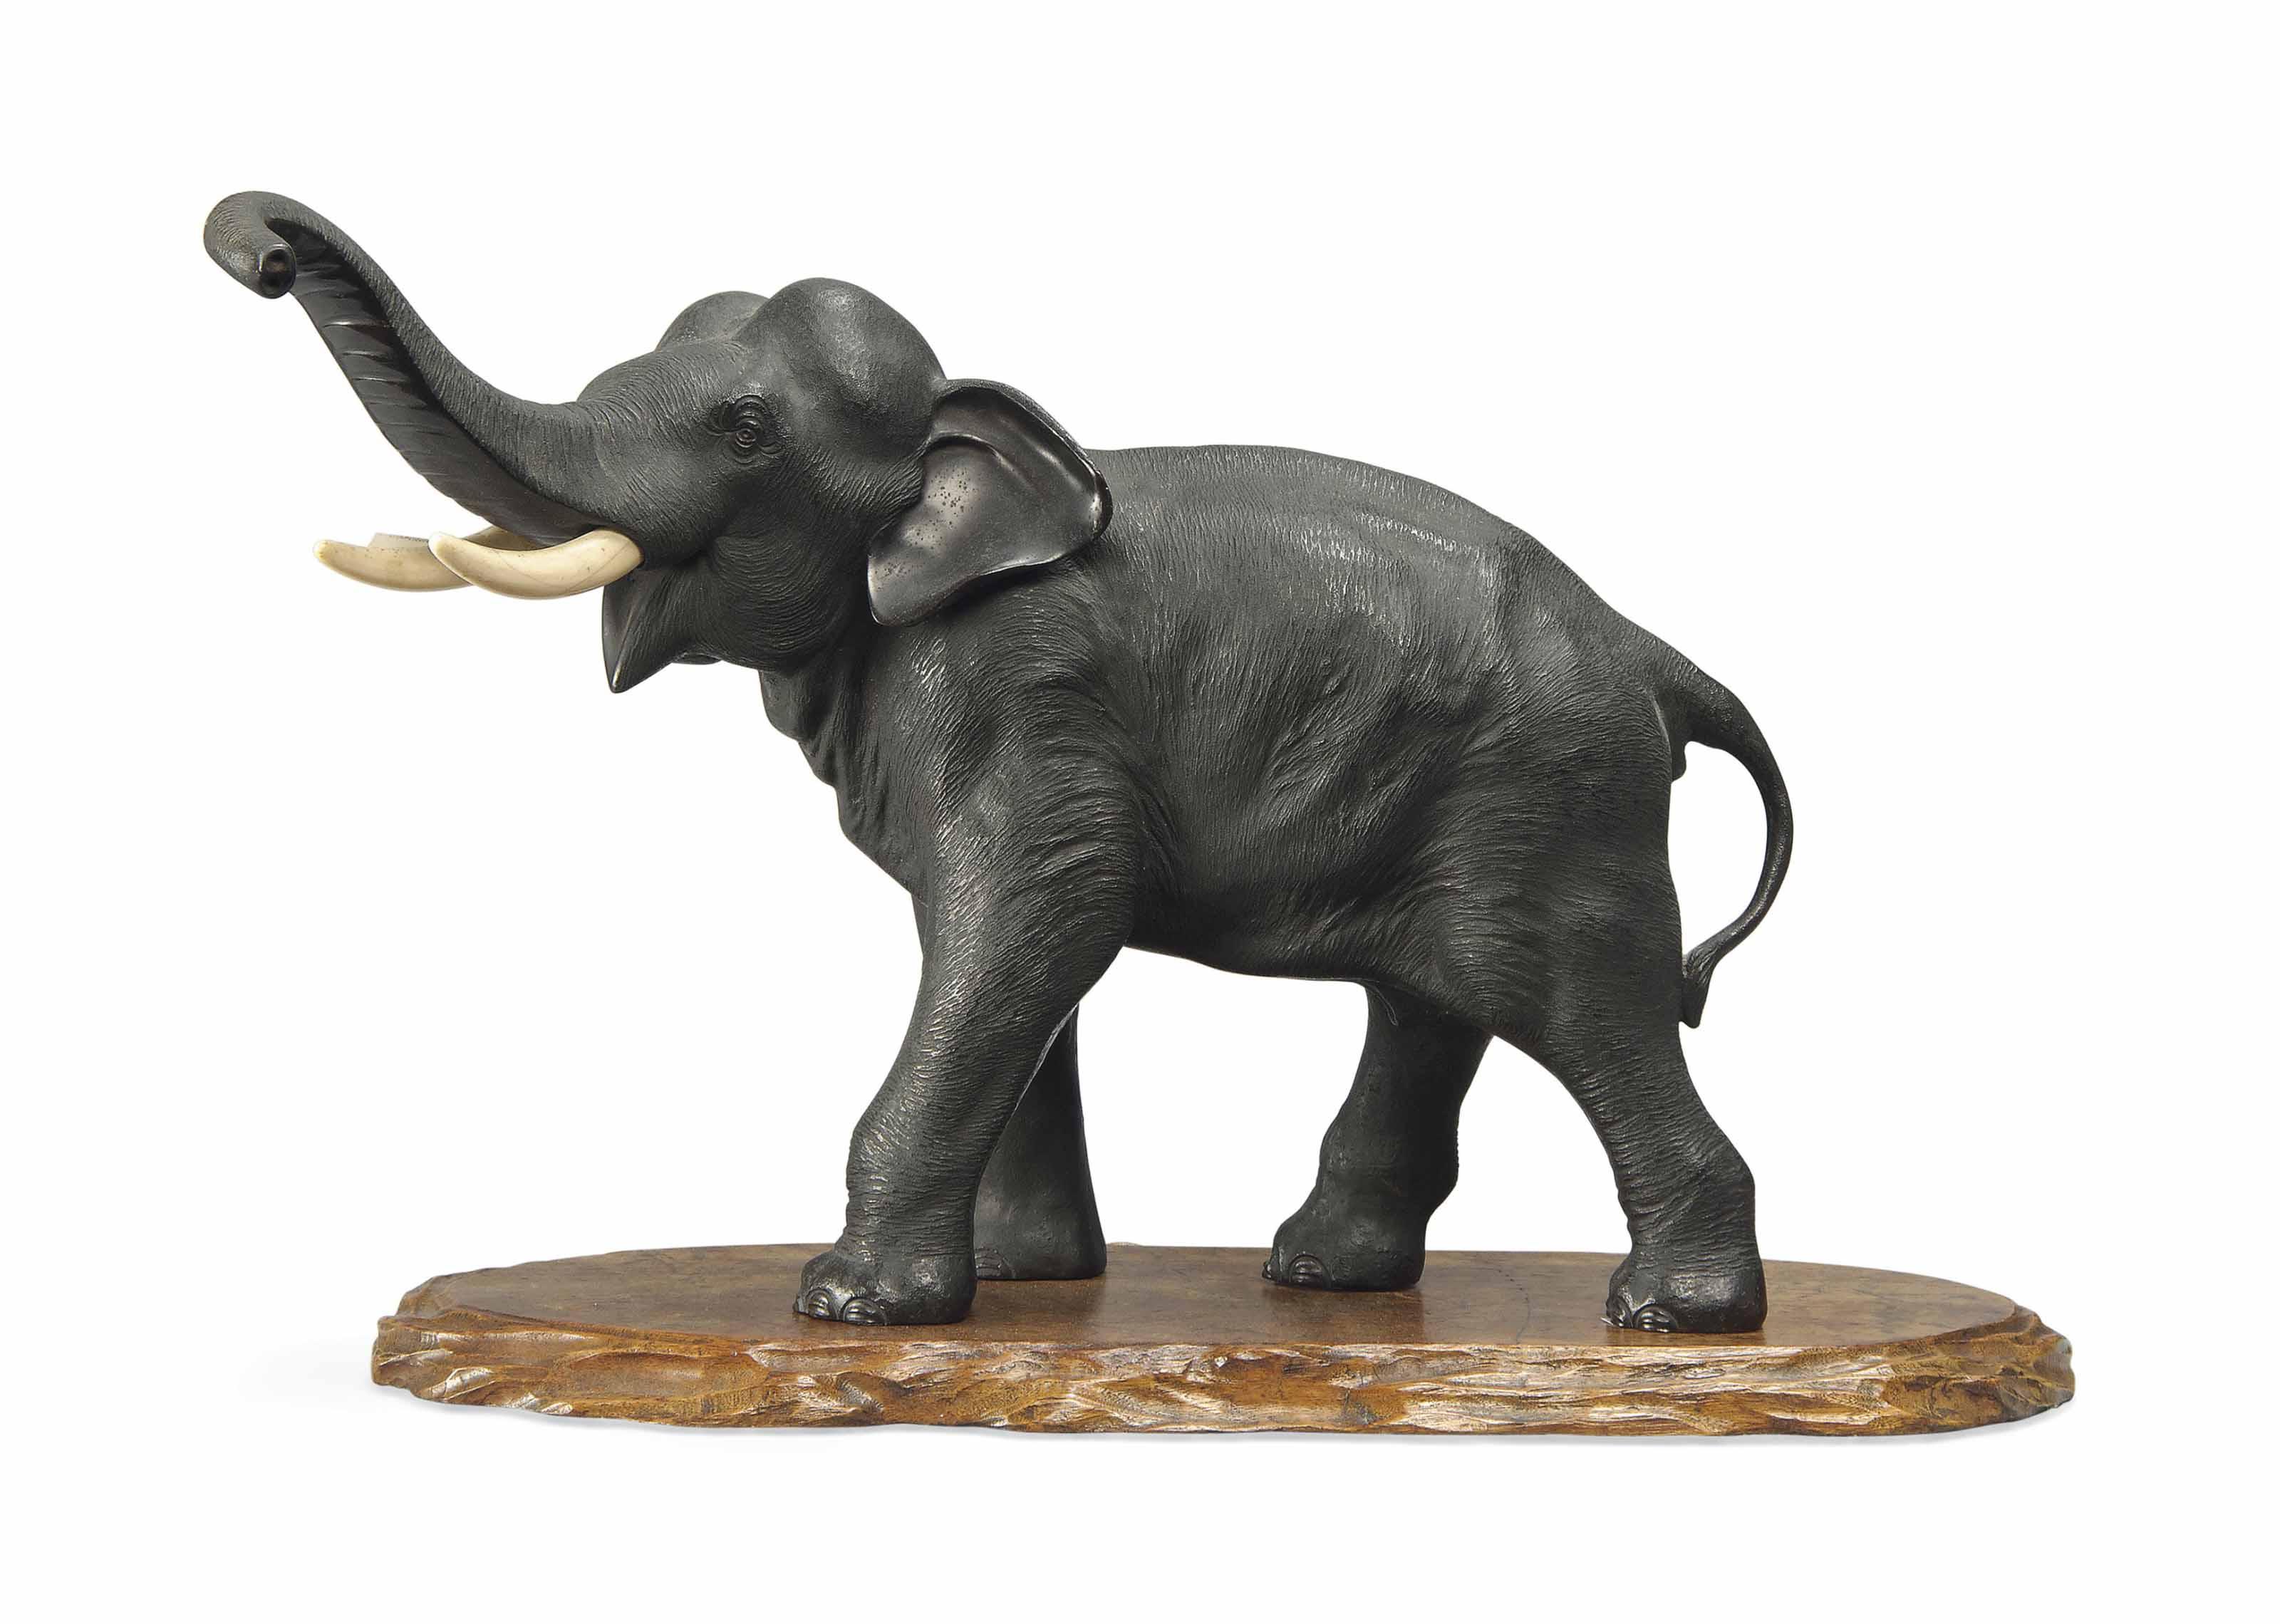 A Japanese Bronze Model of an Elephant | SIGNED SEIYA SAKU, MEIJI